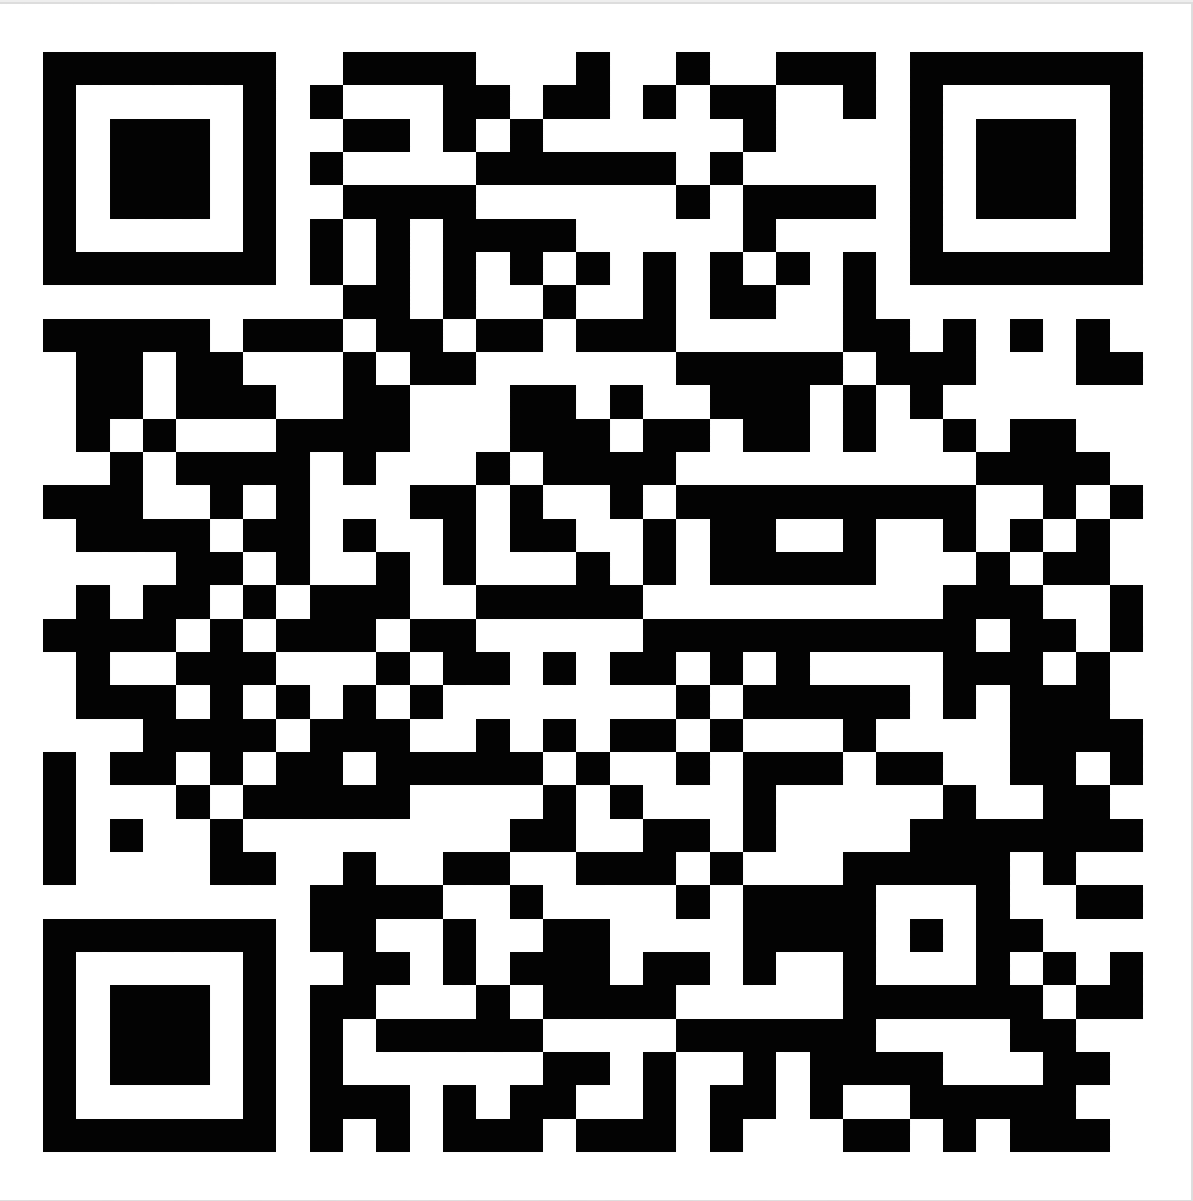 antipolygraph-dot-org-threema-qr-code.png